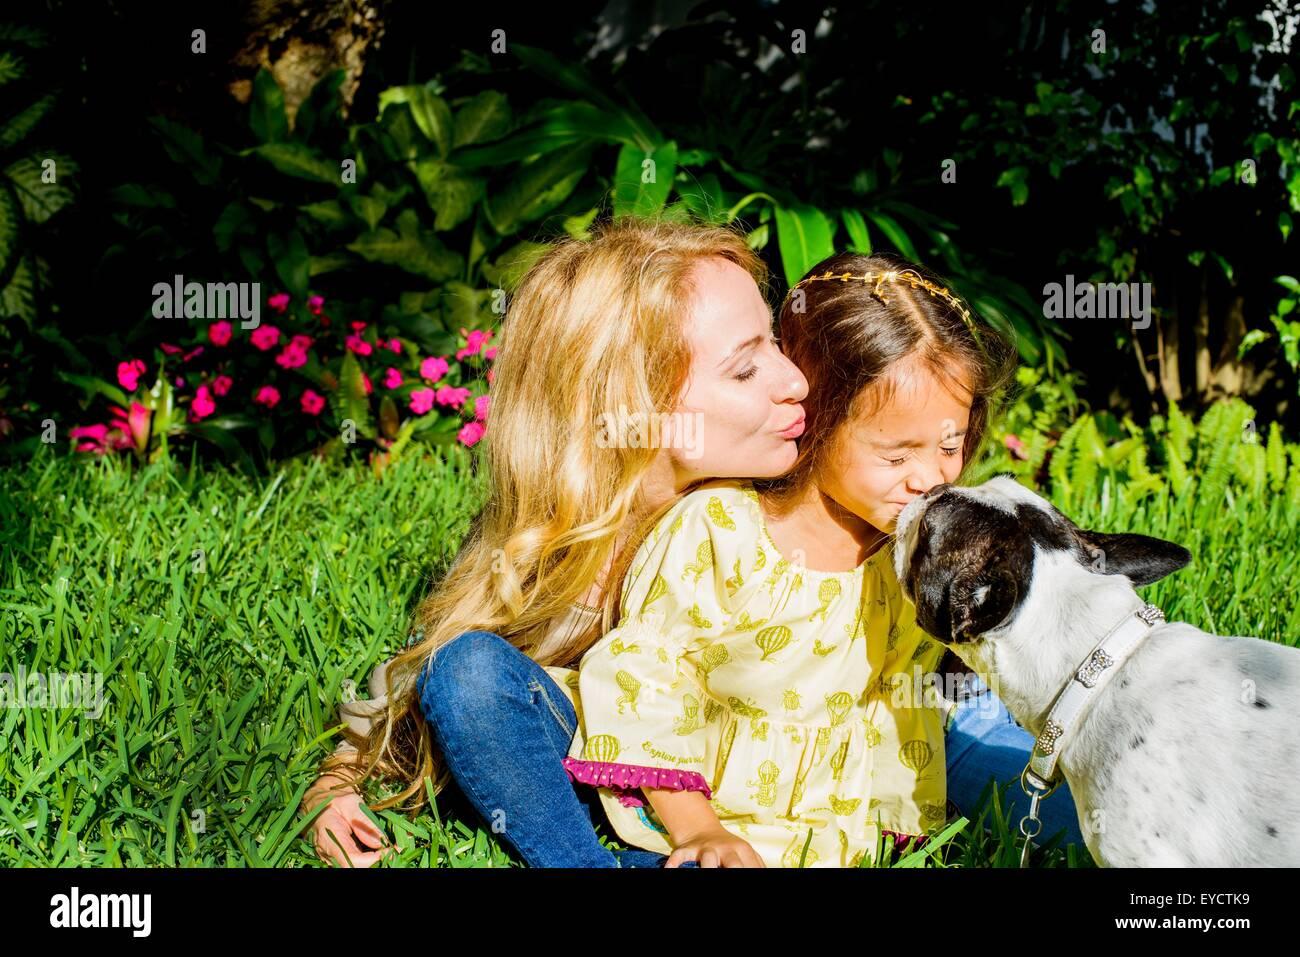 Dog licking girl's face in garden - Stock Image